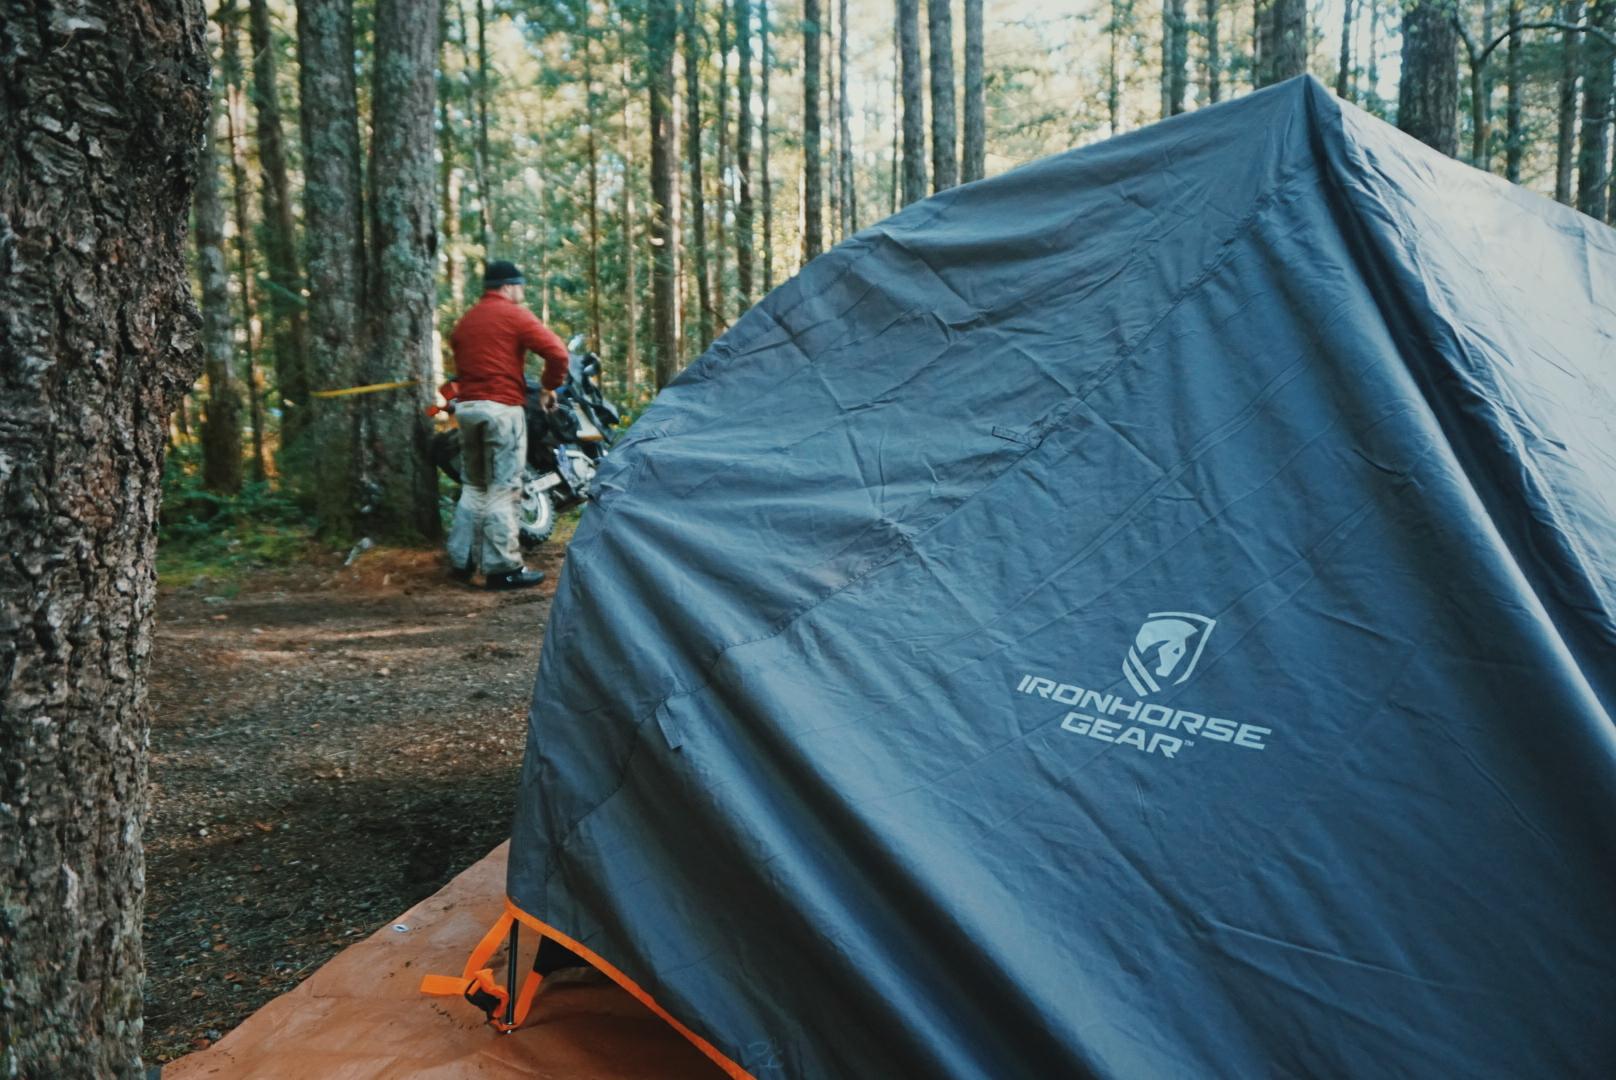 Maiden voyage for my Ironhorse Gear 2+ Tent